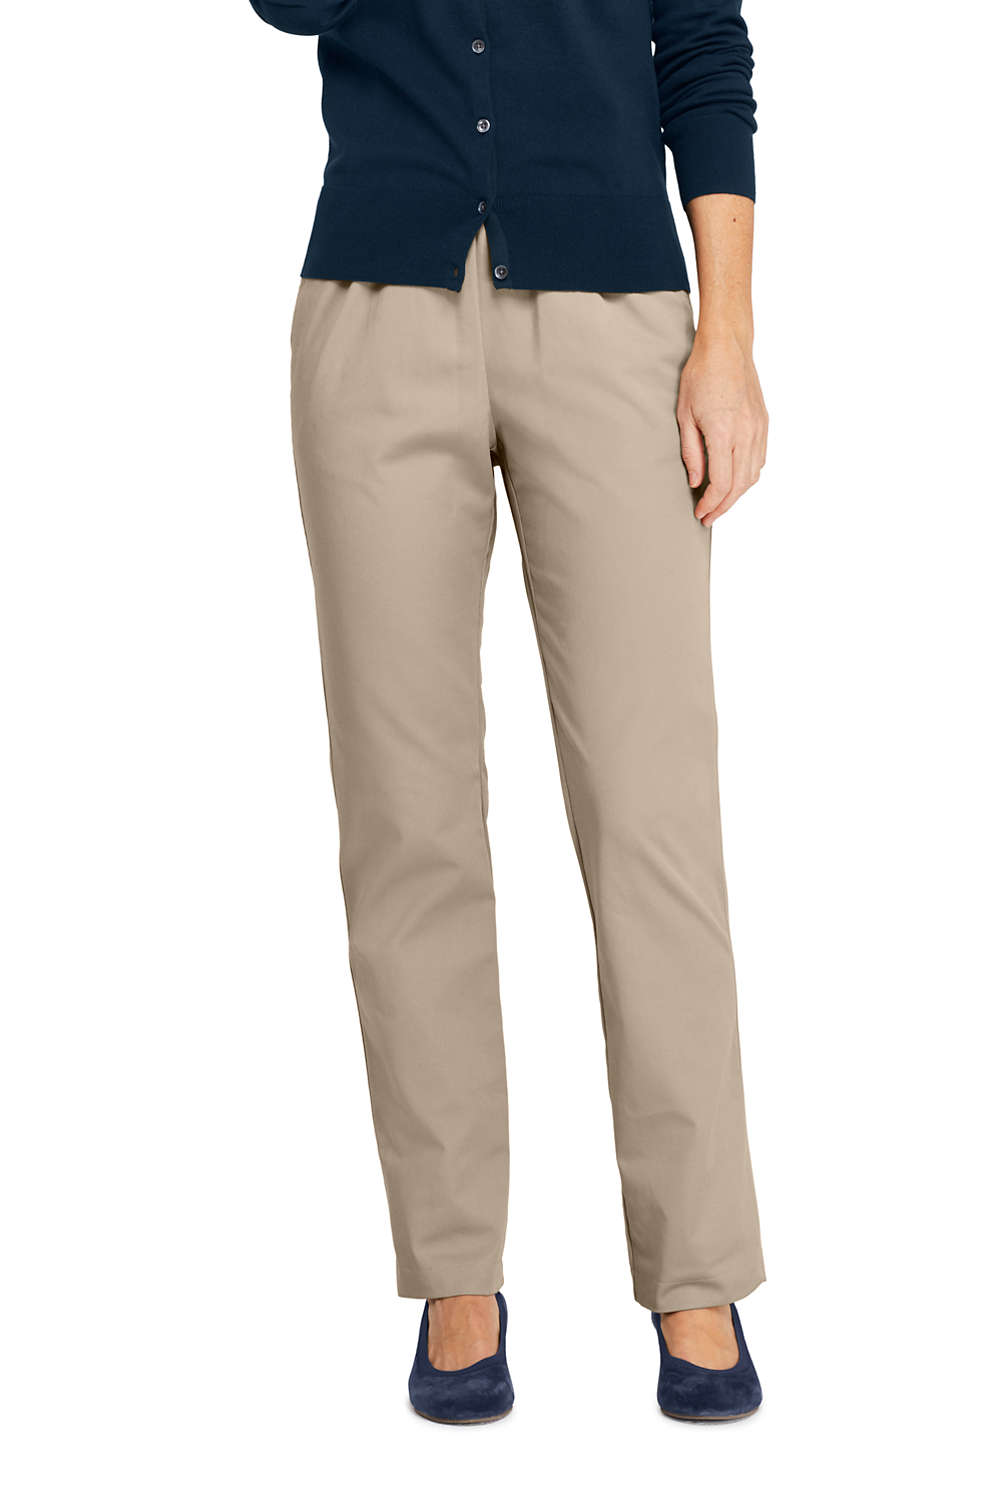 ca60b22f Ladies Wool Dress Slacks | Lixnet AG